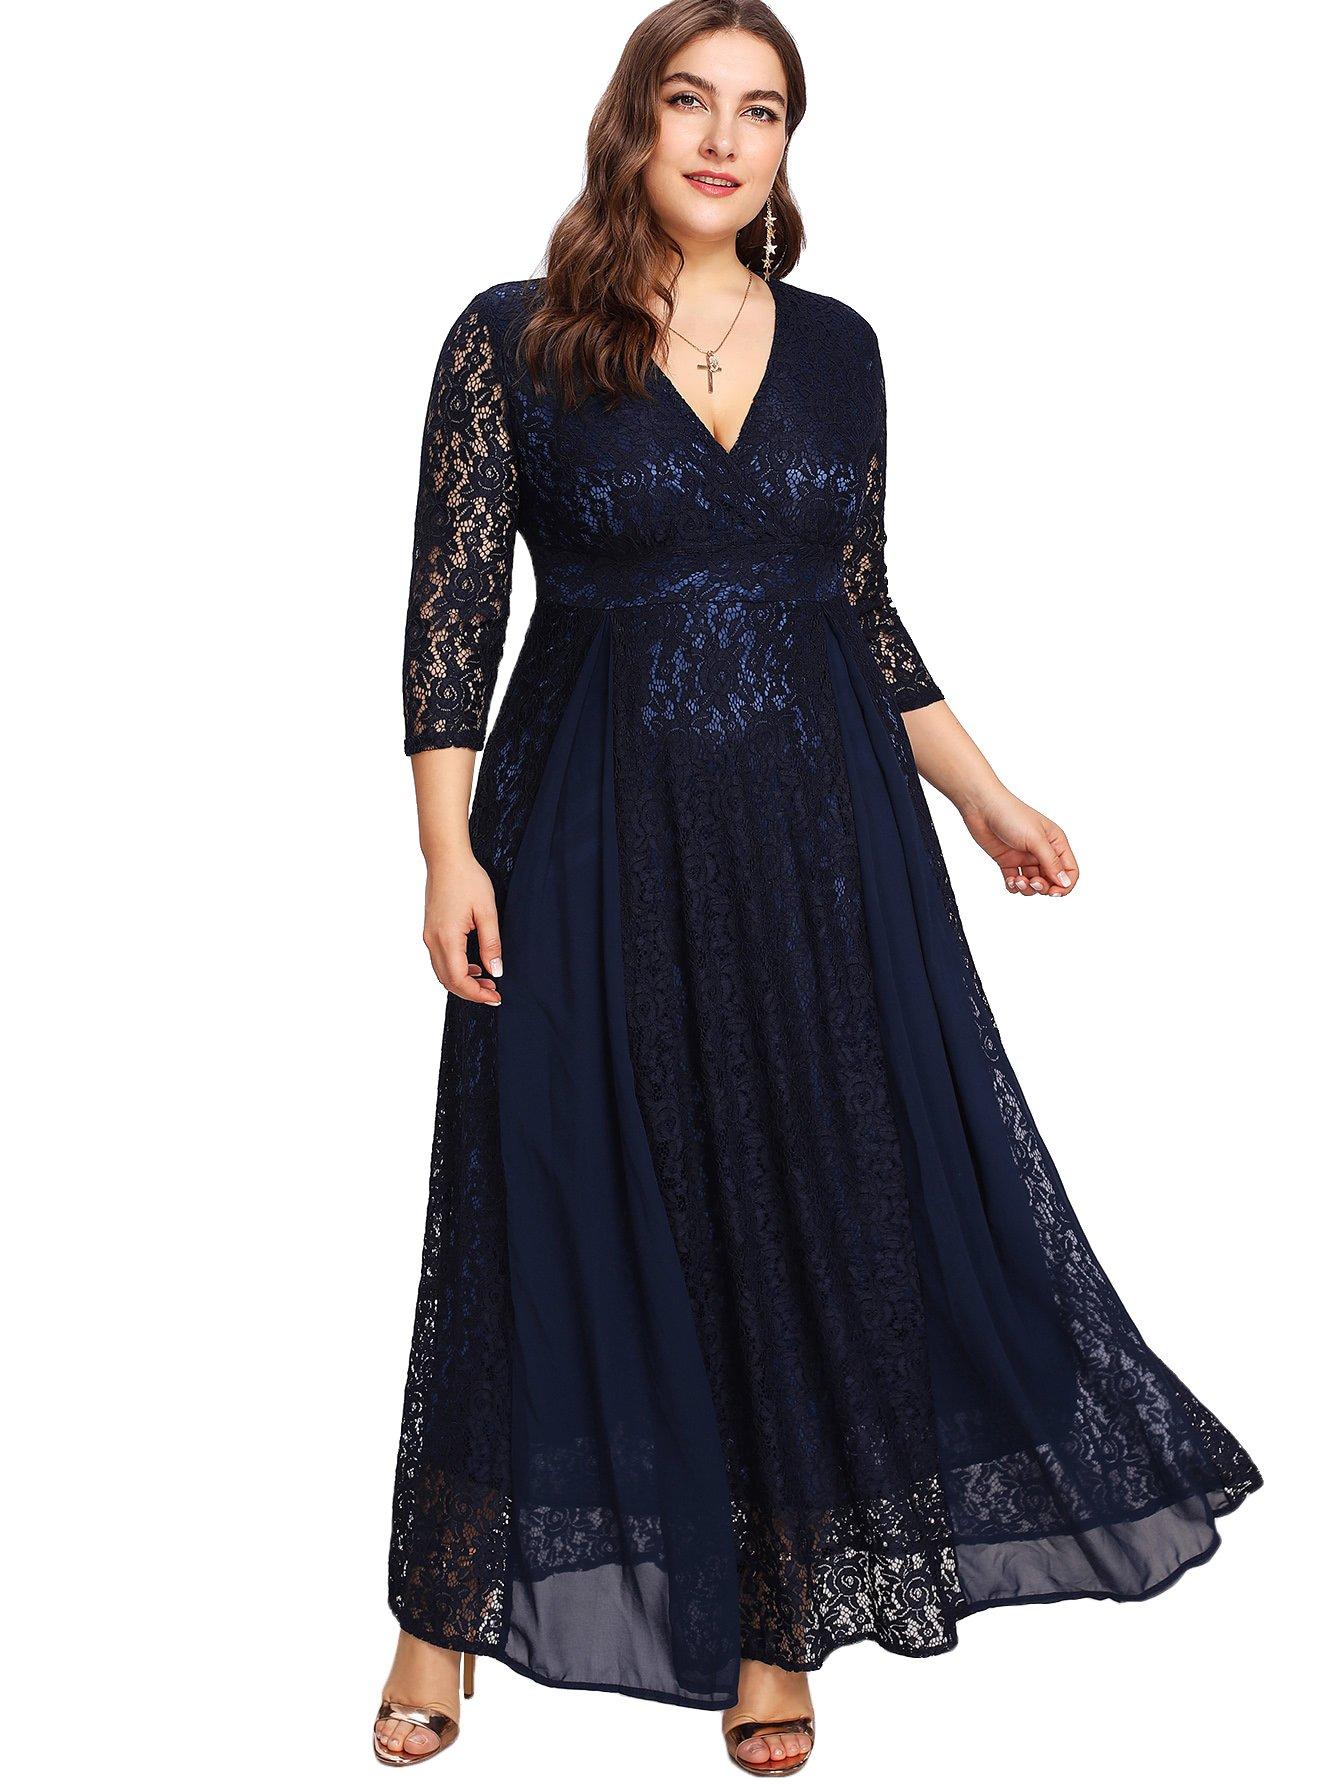 6b9396f0278 Floerns Women s Plus Size High Waist Lace Wrap Maxi Cocktail Party Dress -  Top Plus Size Models - Affordable Plus Size Clothing - Plus Size For Less -  Cheap ...